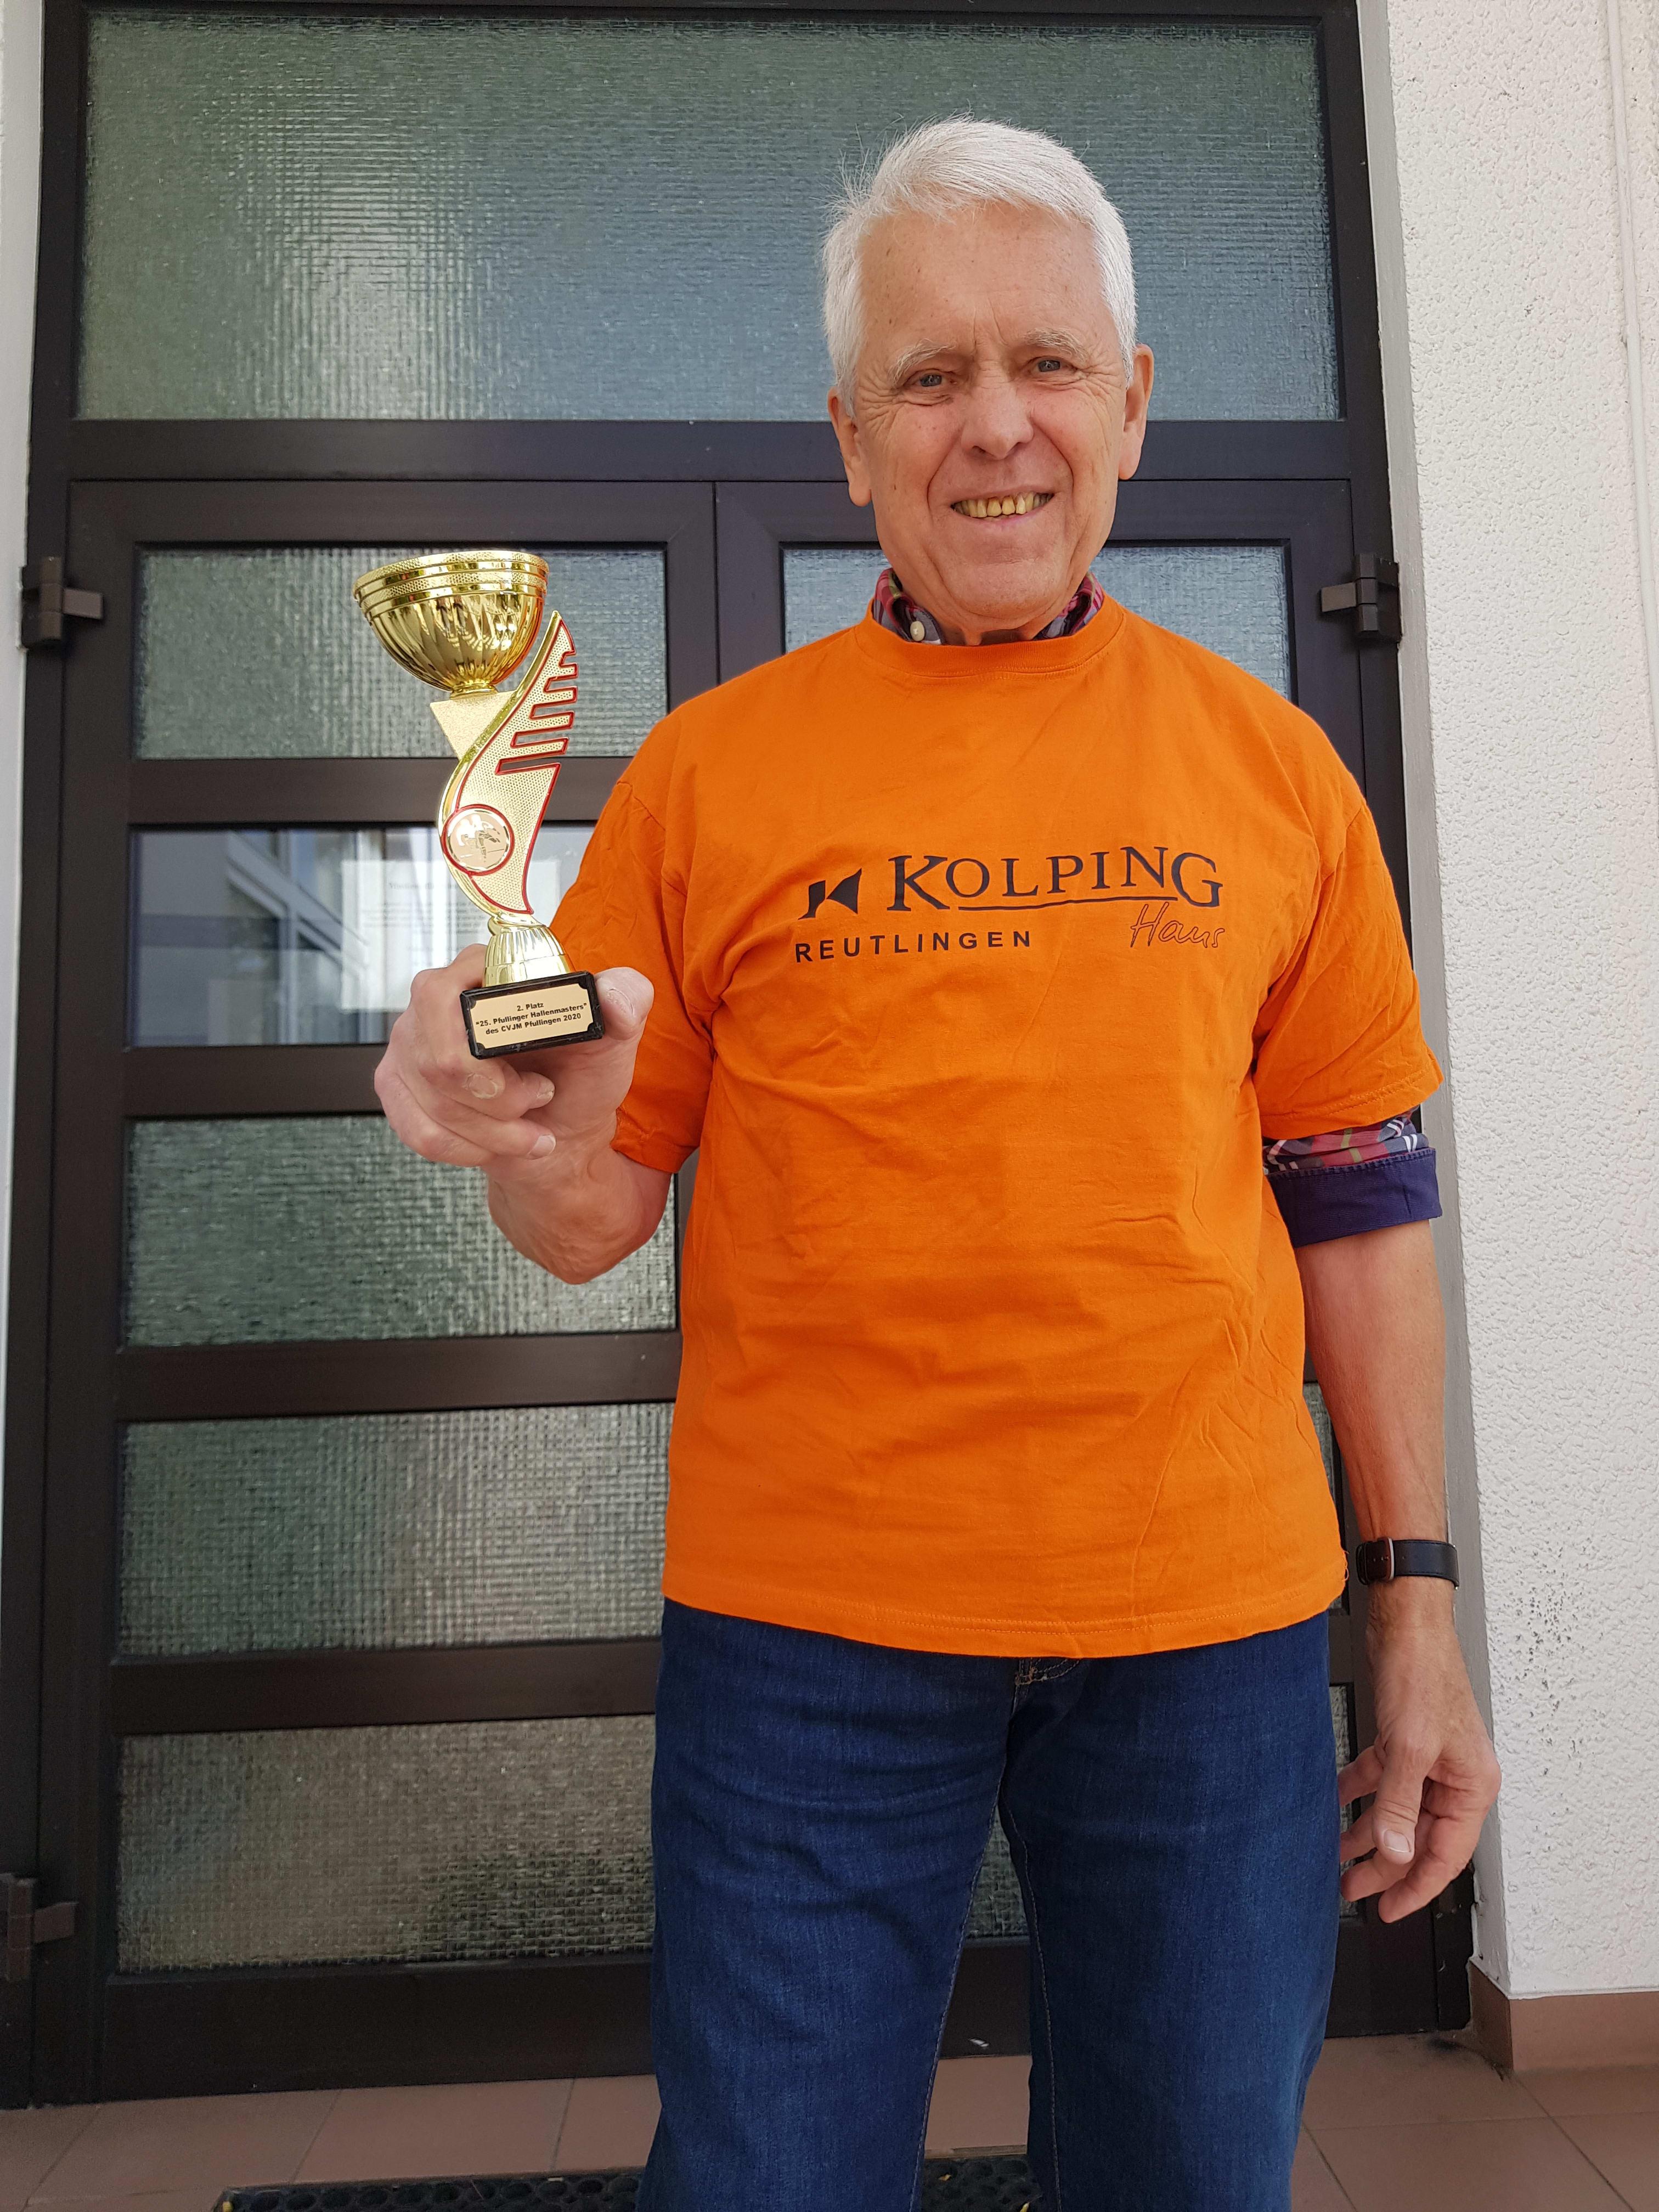 2020-10-06-kolpinghaus-team-holt-2-Platz-beim-pfullinger-hallenmasters-3